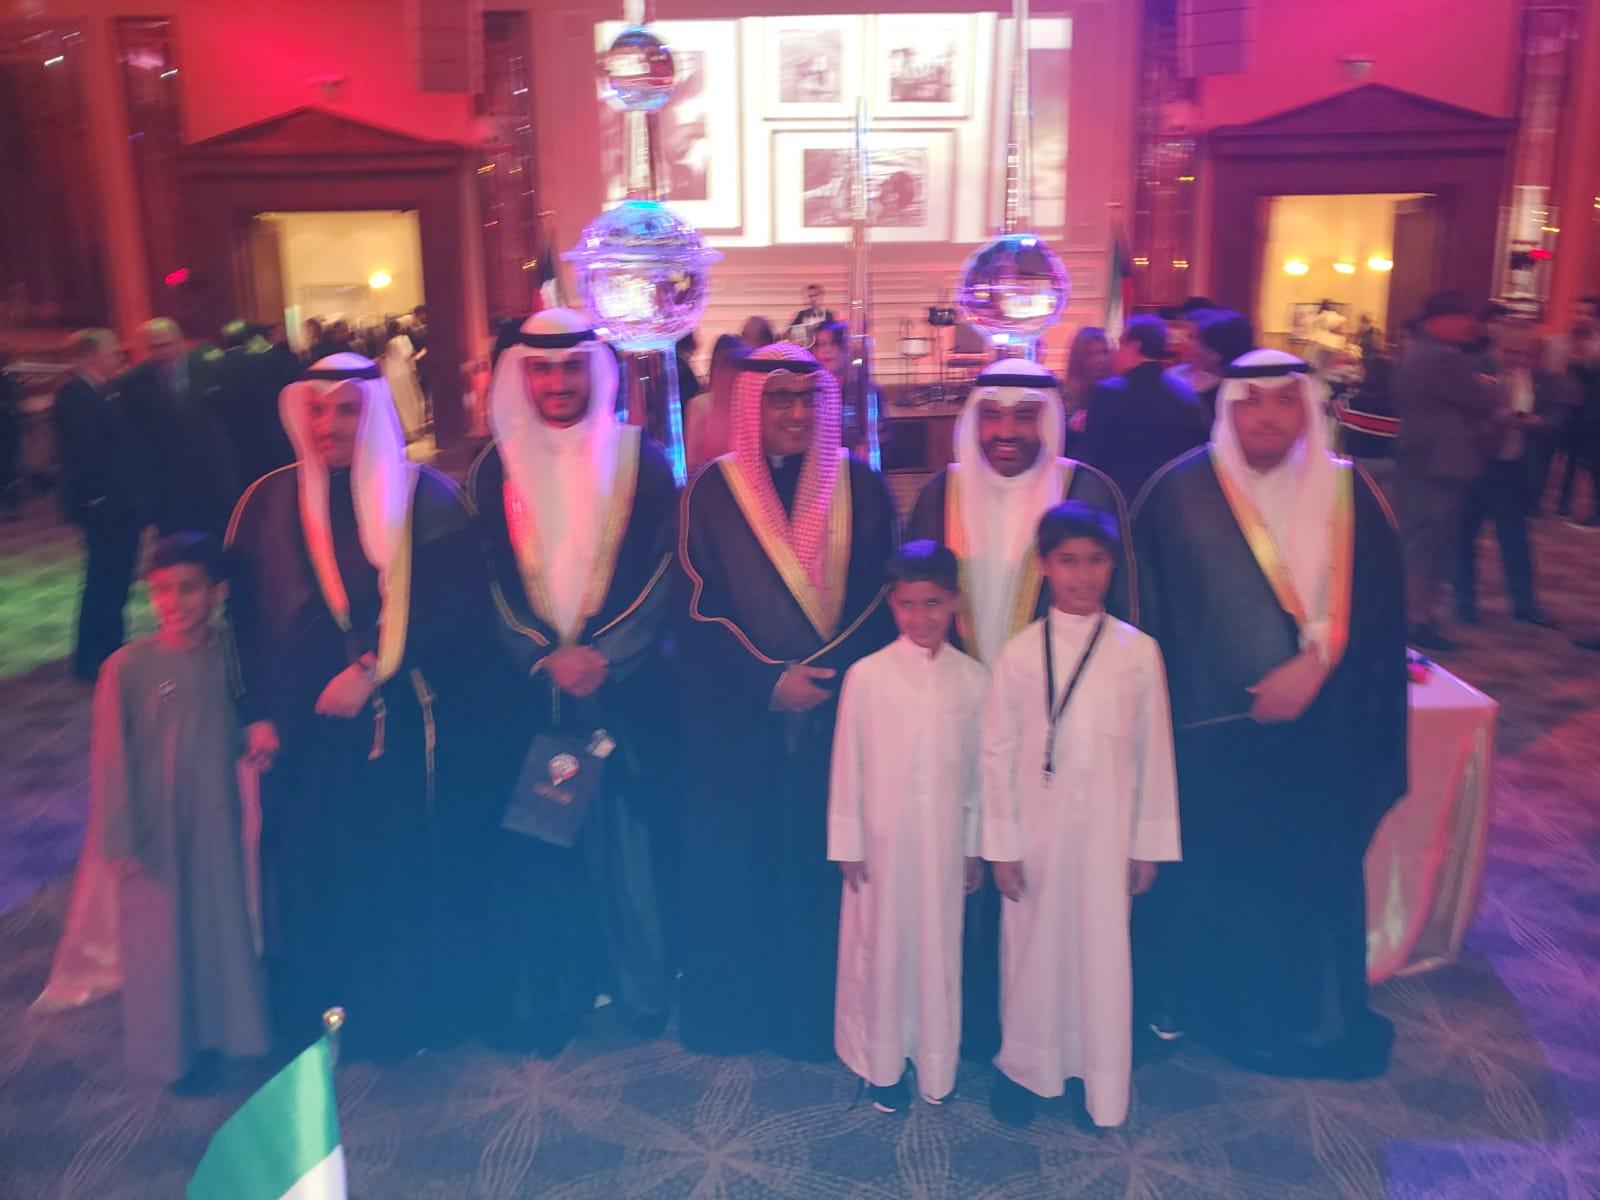 Kuwait National Day & Kuwait Liberation Day 2020 Celebration In Los Angeles